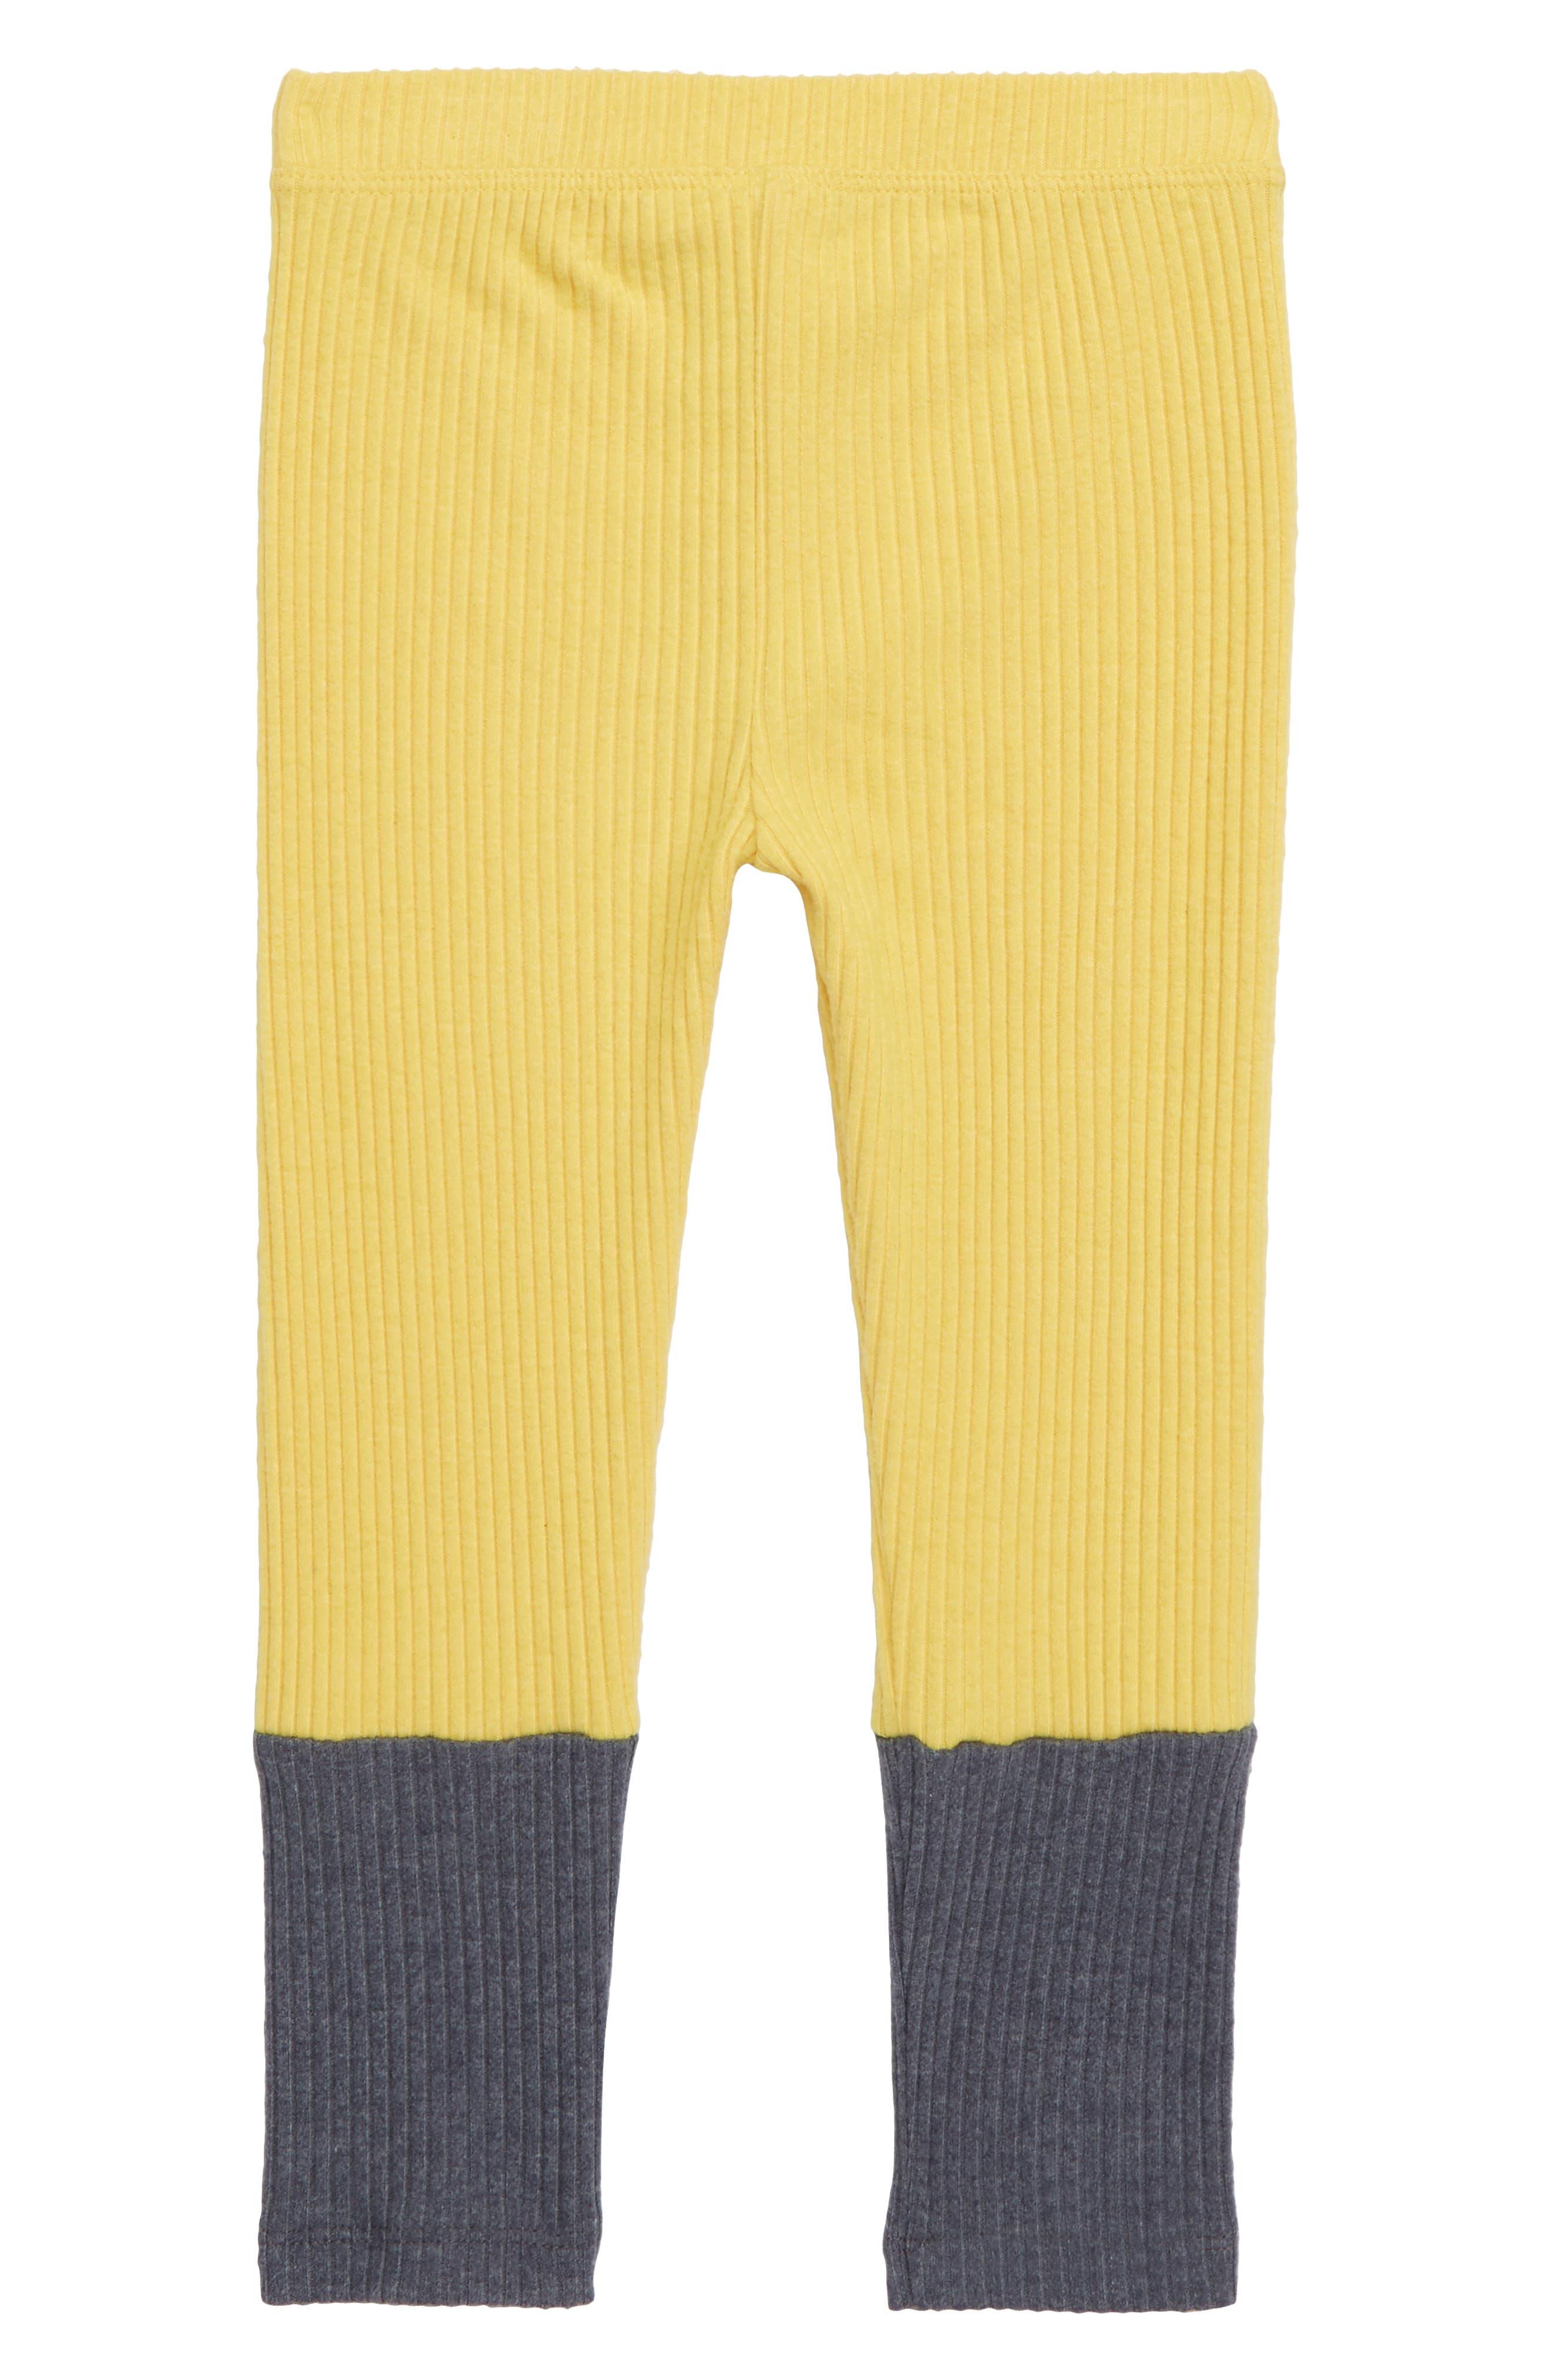 Toddler Girls Stem Colorblock Ribbed Leggings Size 2T  Yellow